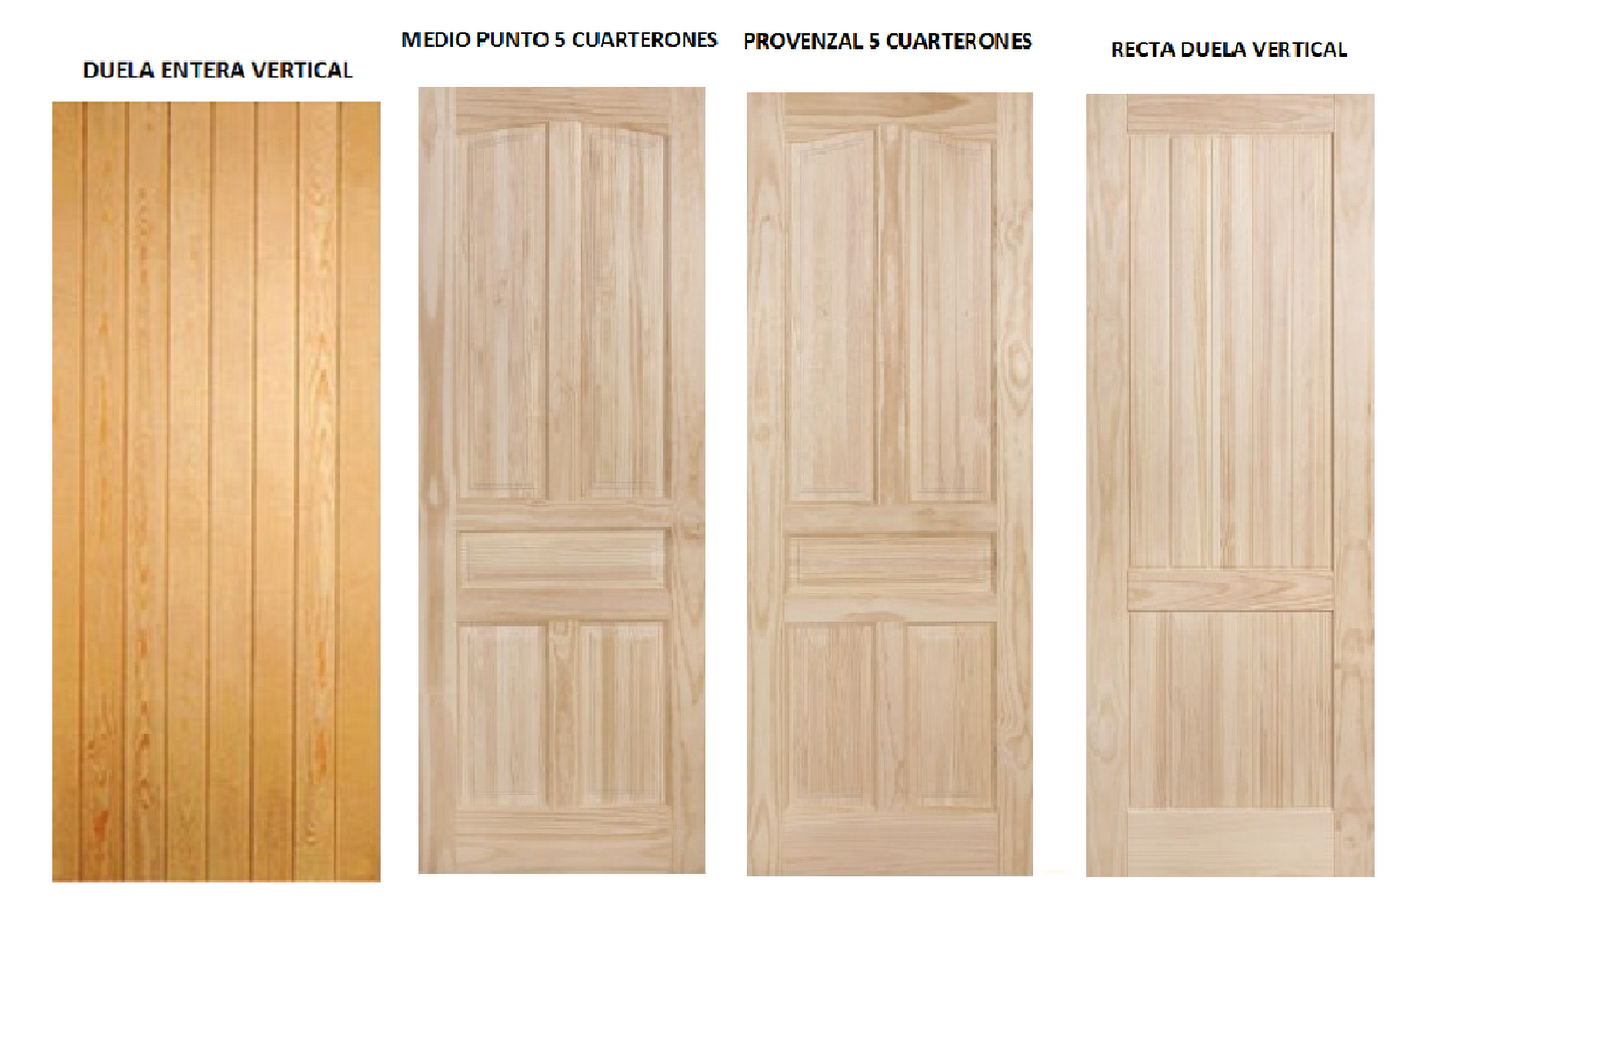 Carpinter a de madera mart n torralbo puertas for Puertas madera maciza